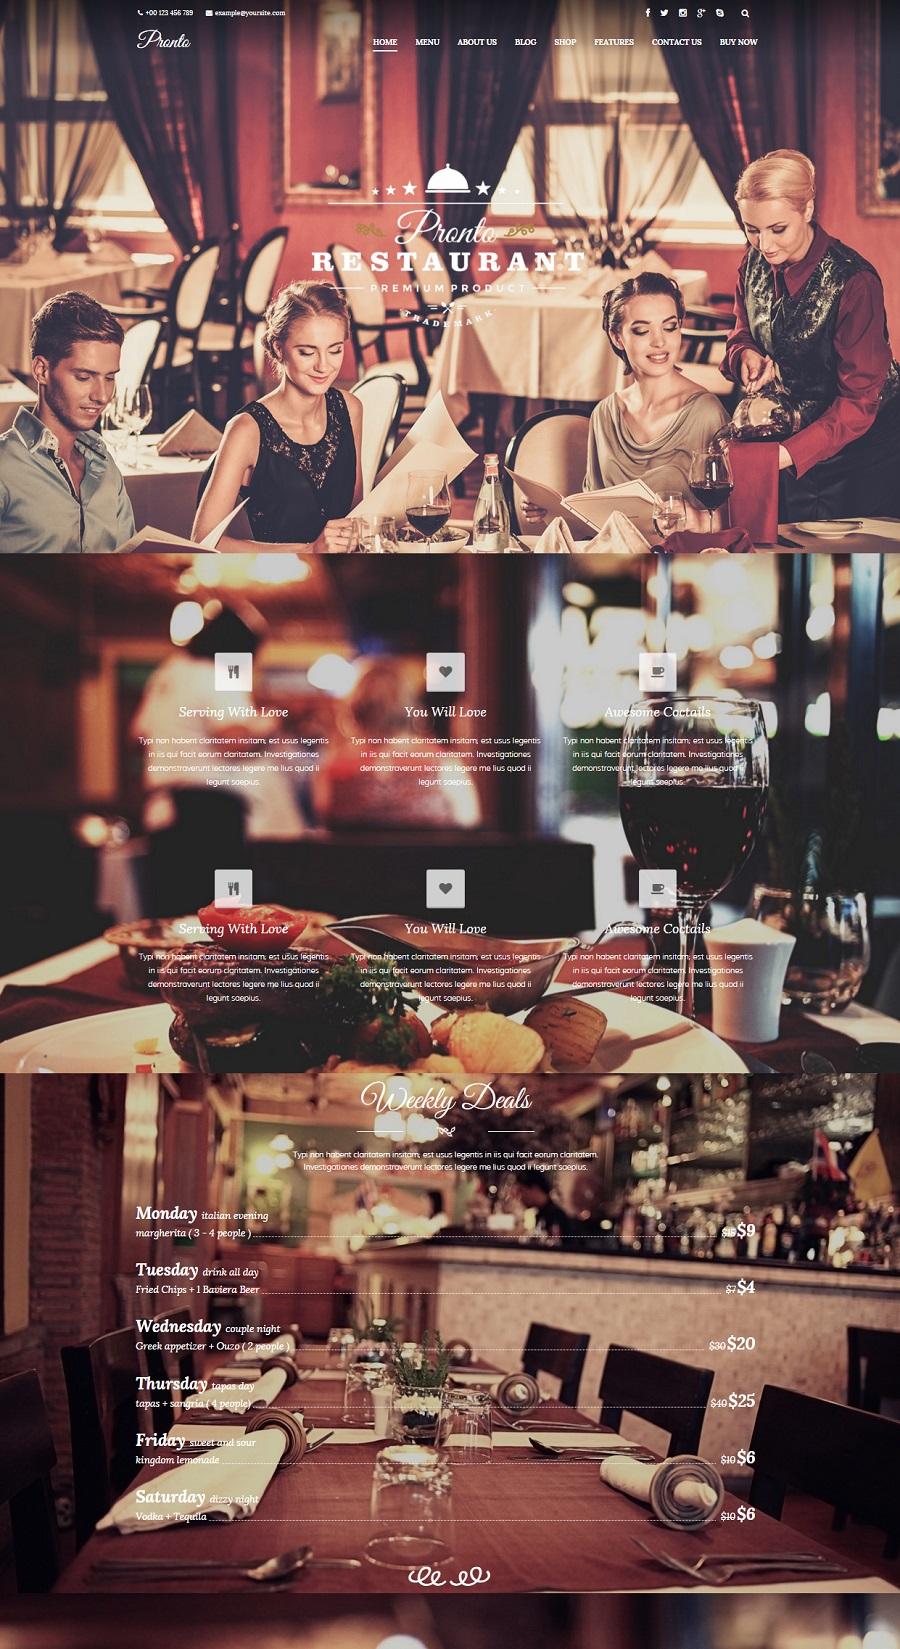 pronto restaurant wordpress theme